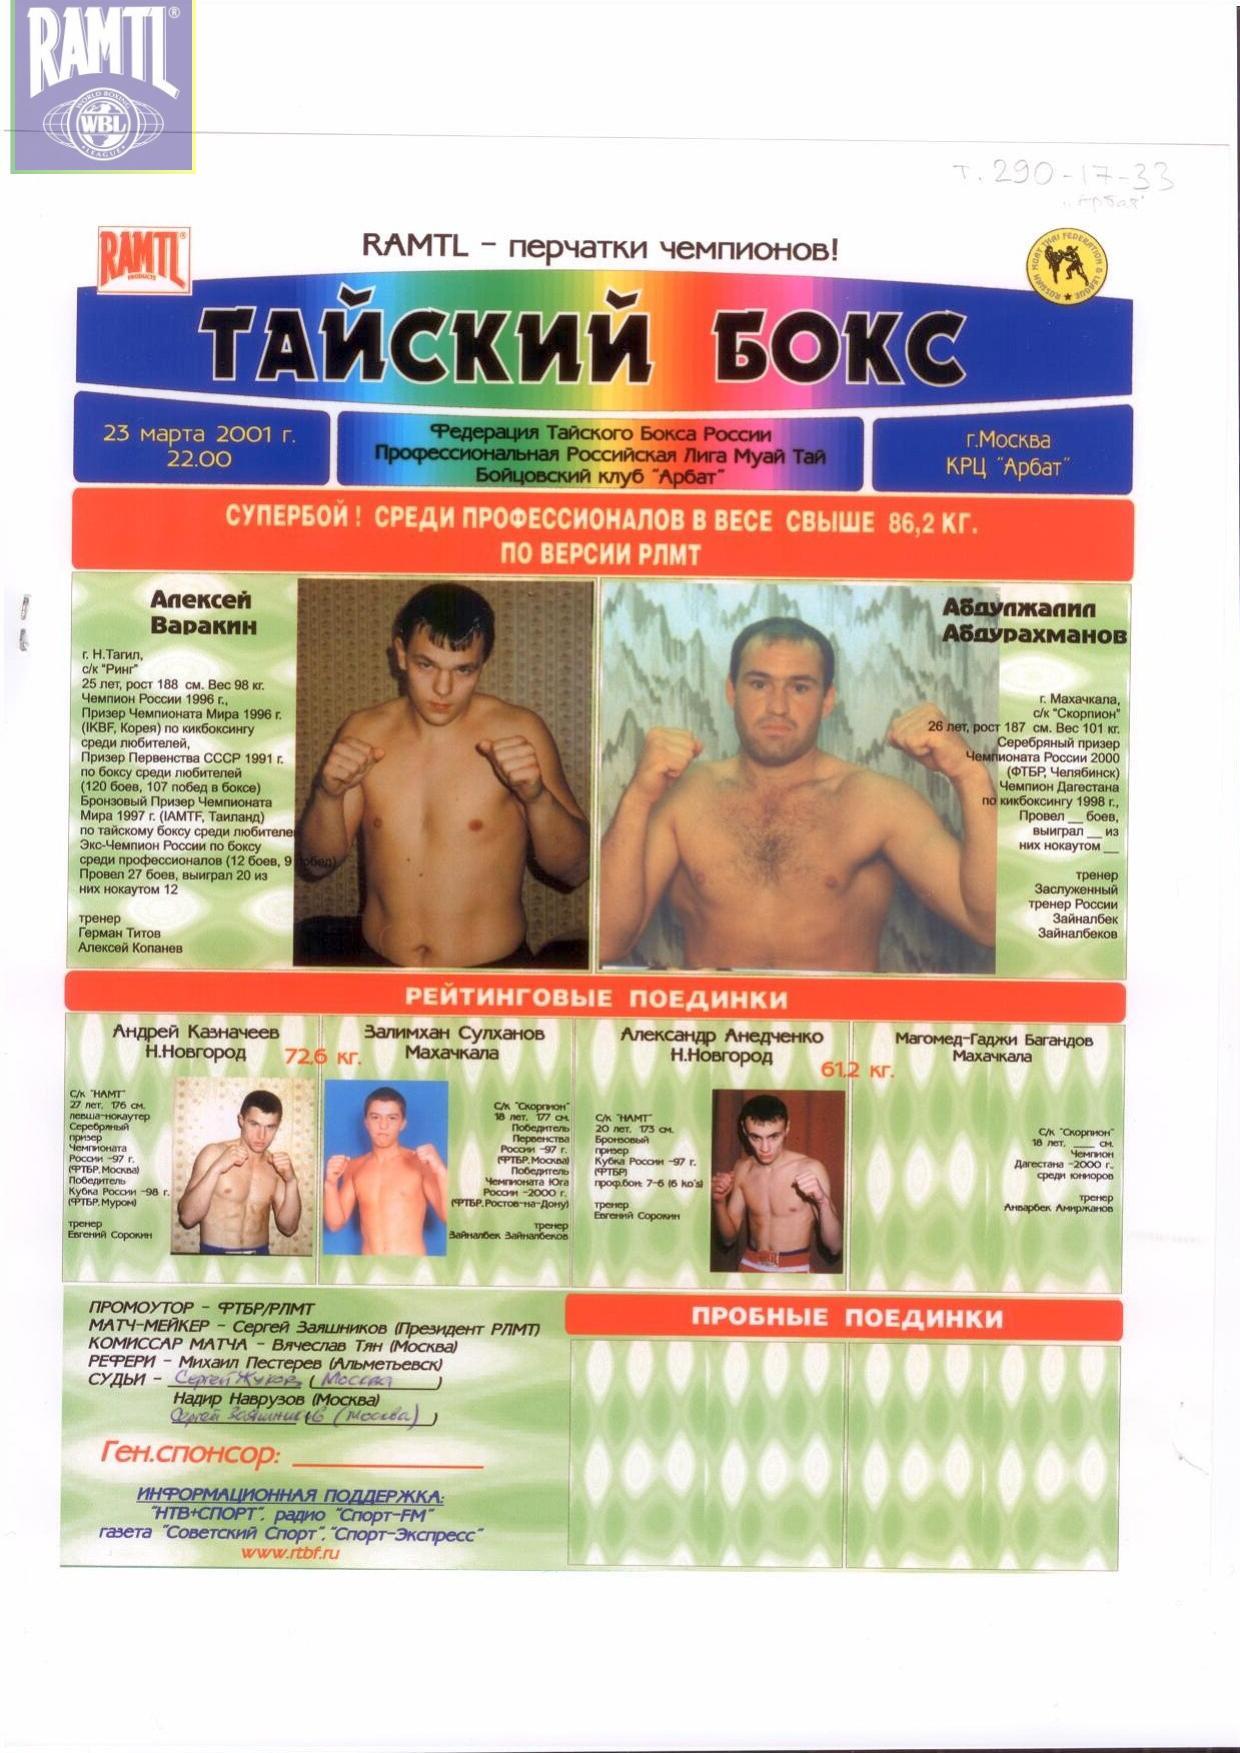 2001-03-23_Moskva